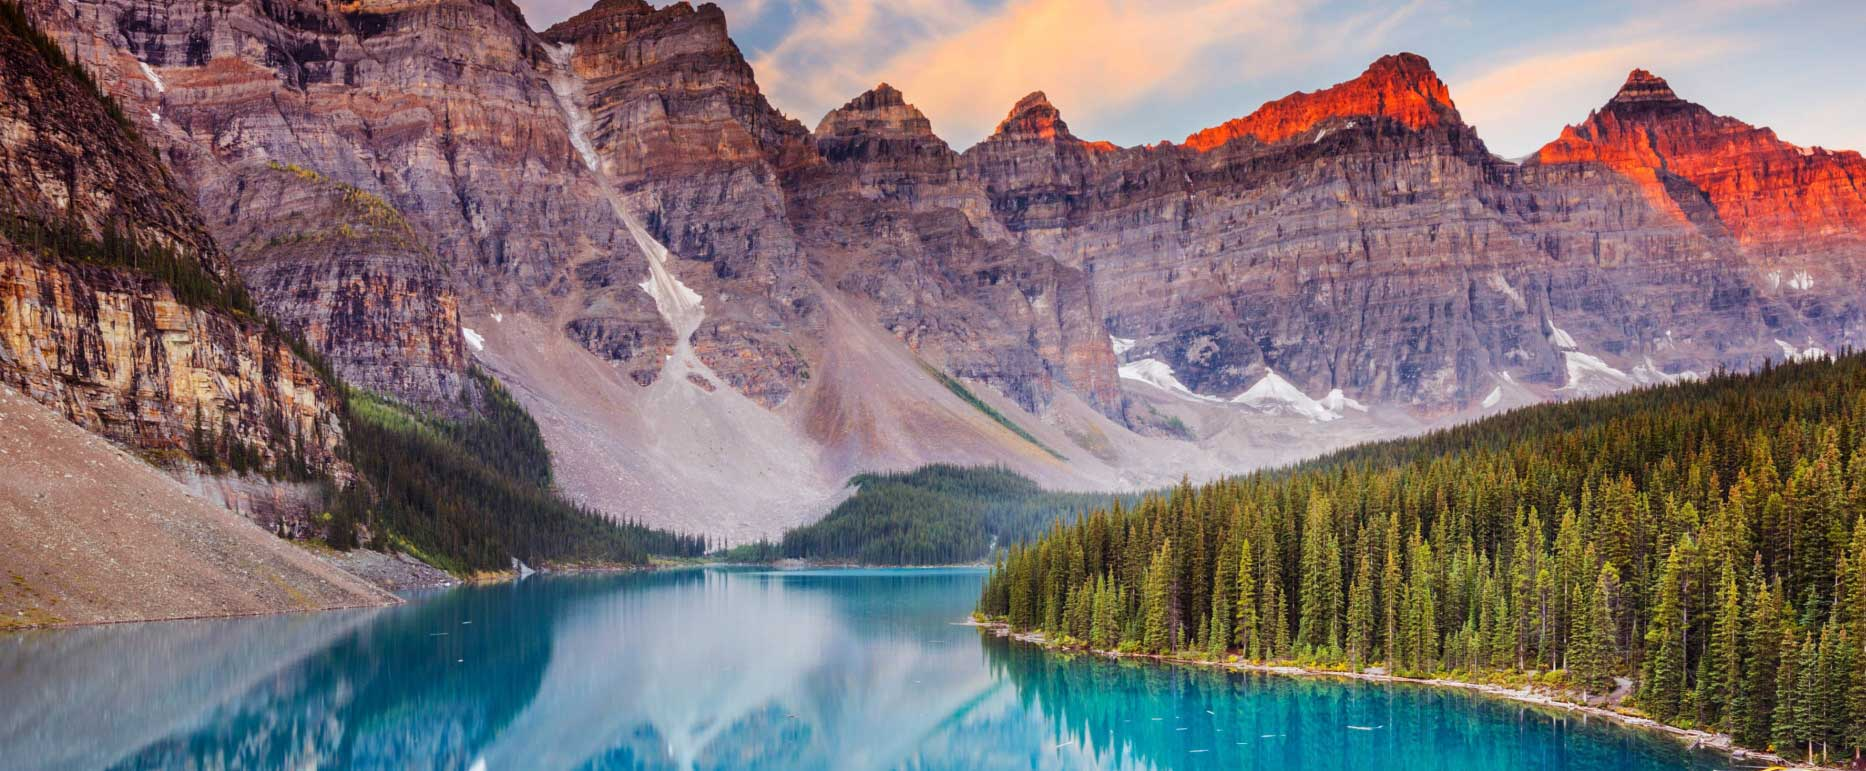 Explore Canada, Alaska & USA